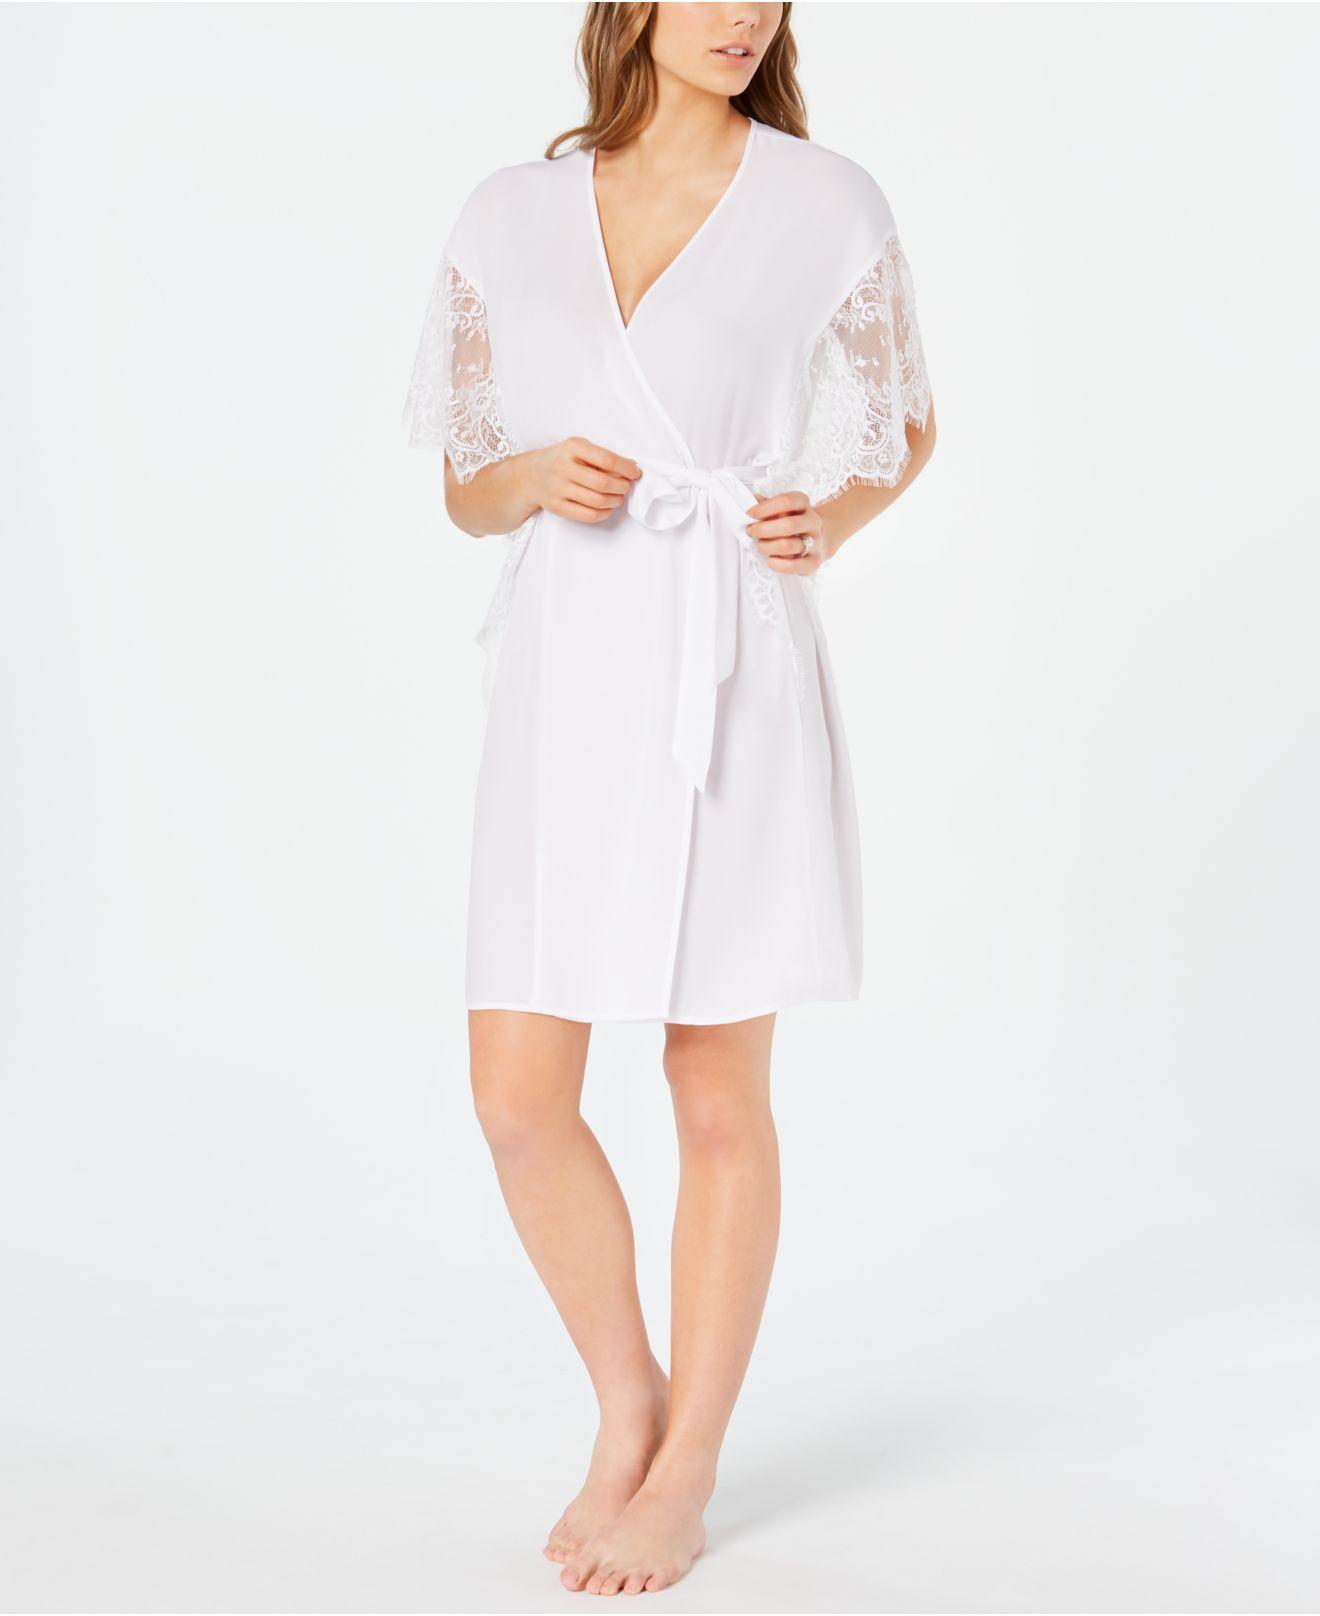 ea7e4d8378bf7 Lyst - INC International Concepts I.n.c. Lace-sleeve Chiffon Wrap ...